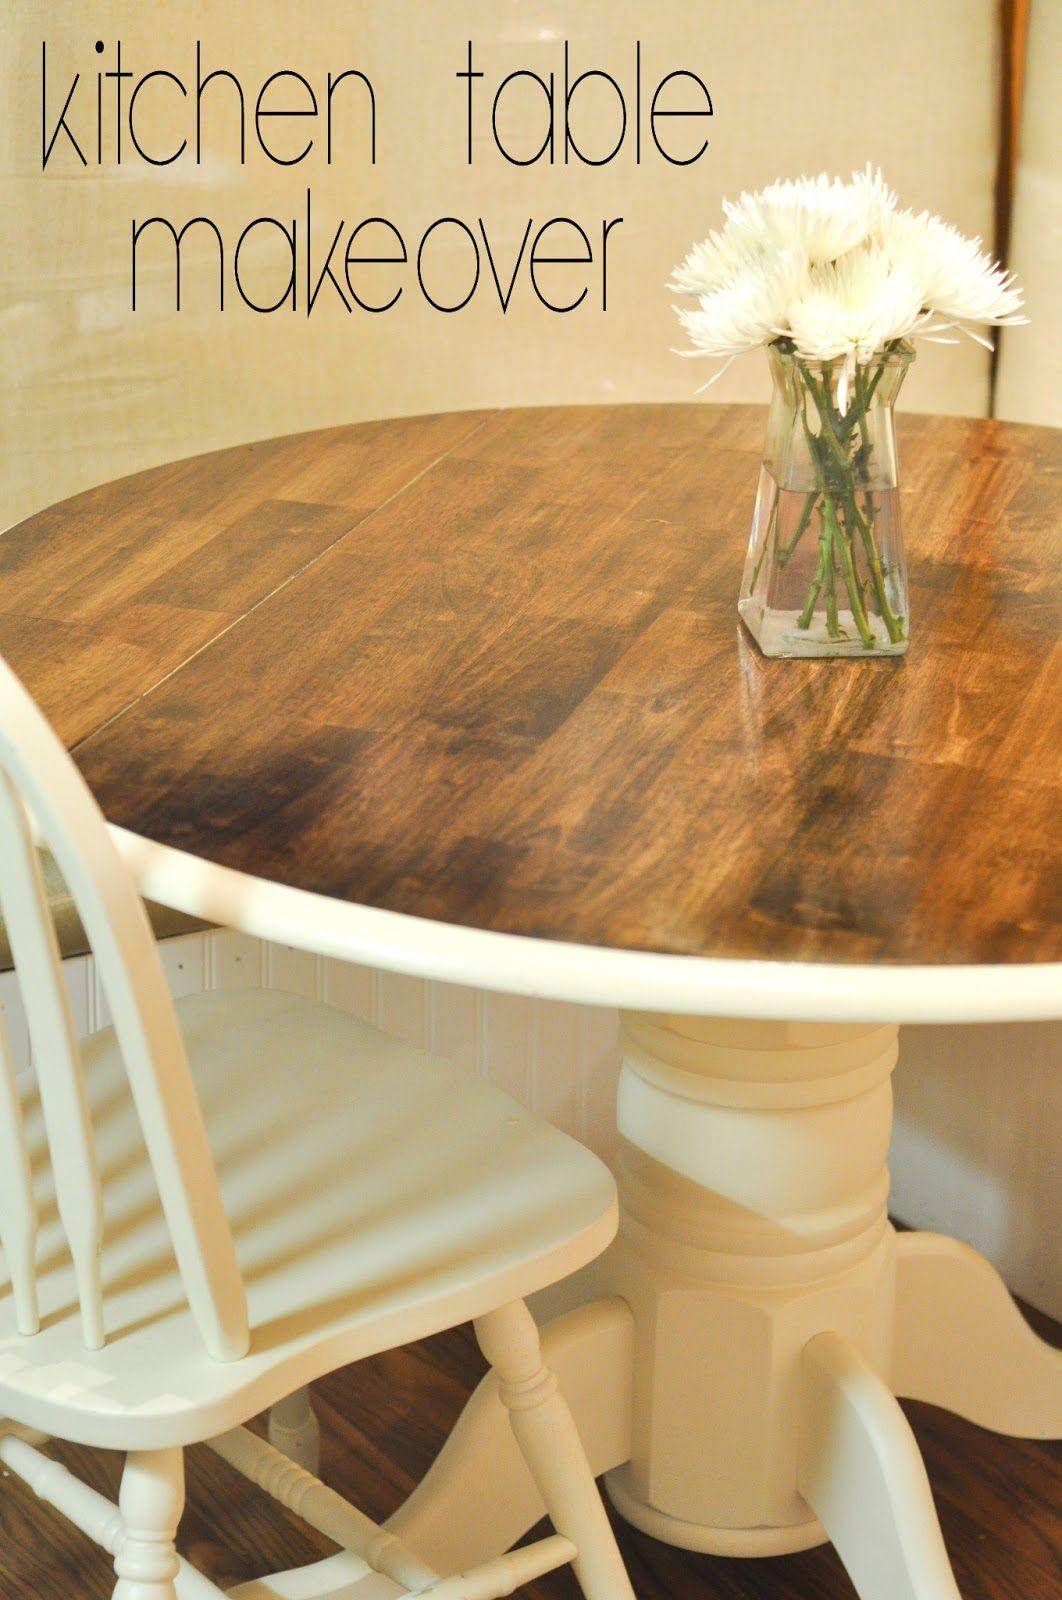 Decorating Through Dental School Kitchen Table Makeover  Diy Cool Diy Dining Room Table Makeover Design Inspiration